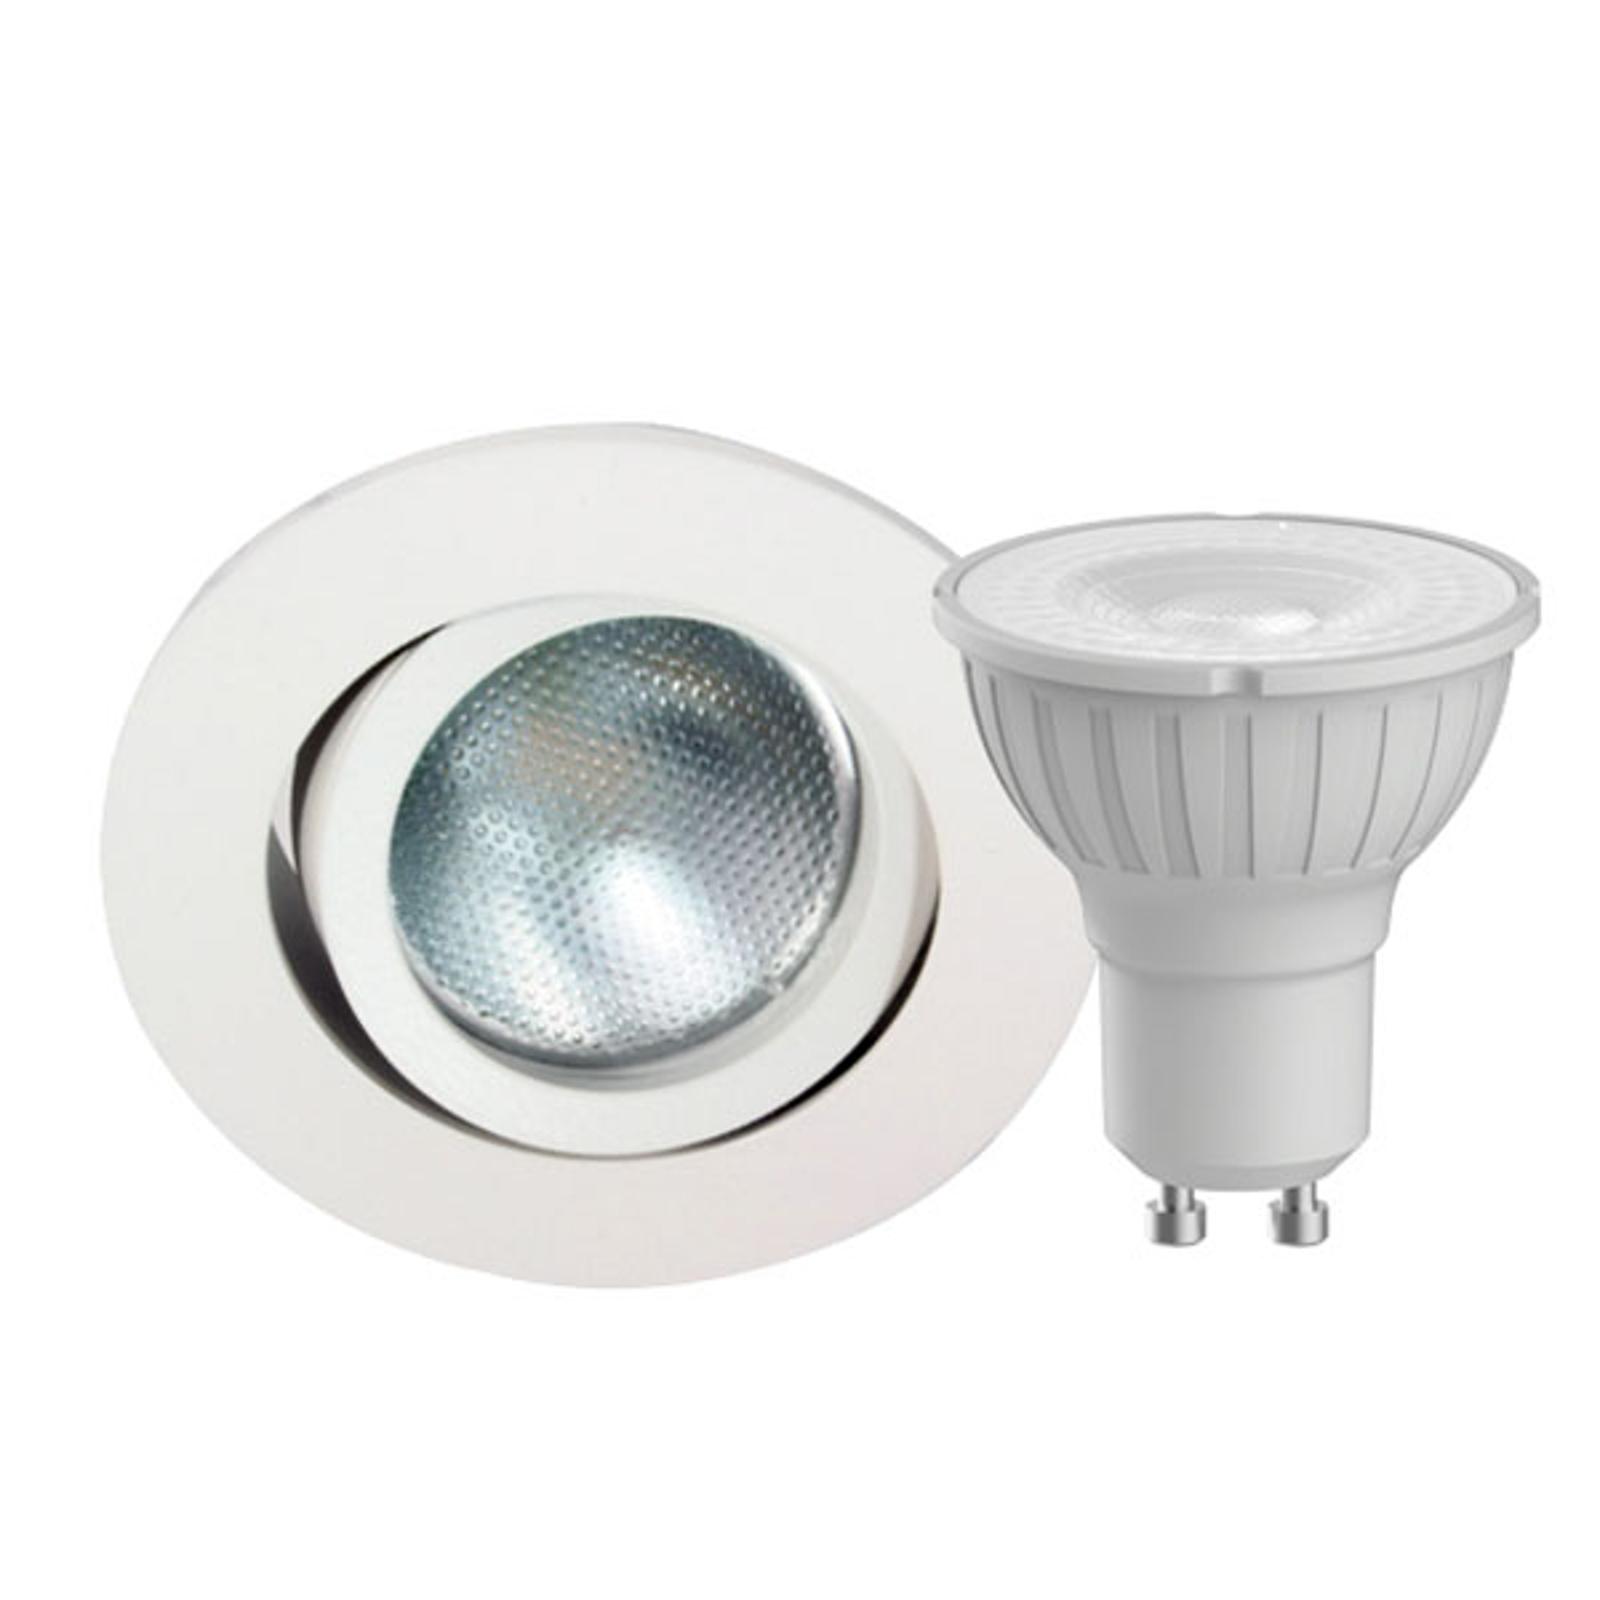 Megaman DecoclicSet anello LED GU10 4,2W bianco